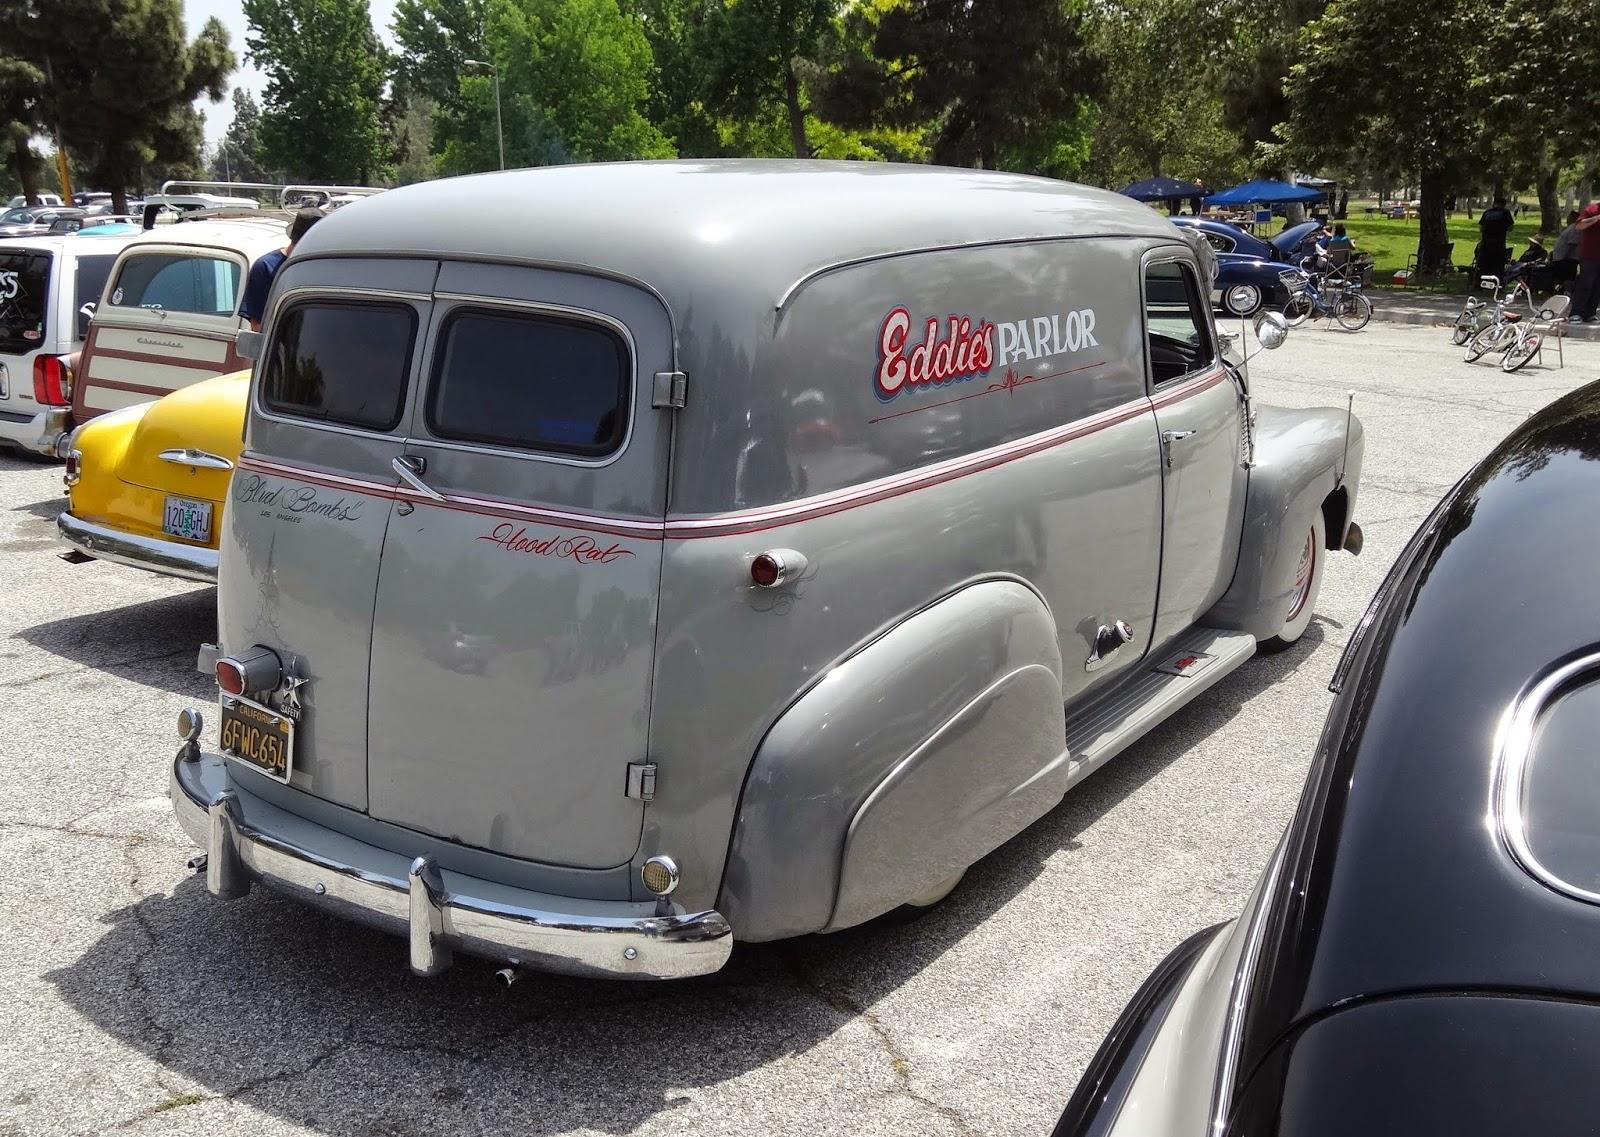 Truck 1949 chevy panel truck : Nostalgia on Wheels: 1949 Chevy 1/2 Ton Panel Truck